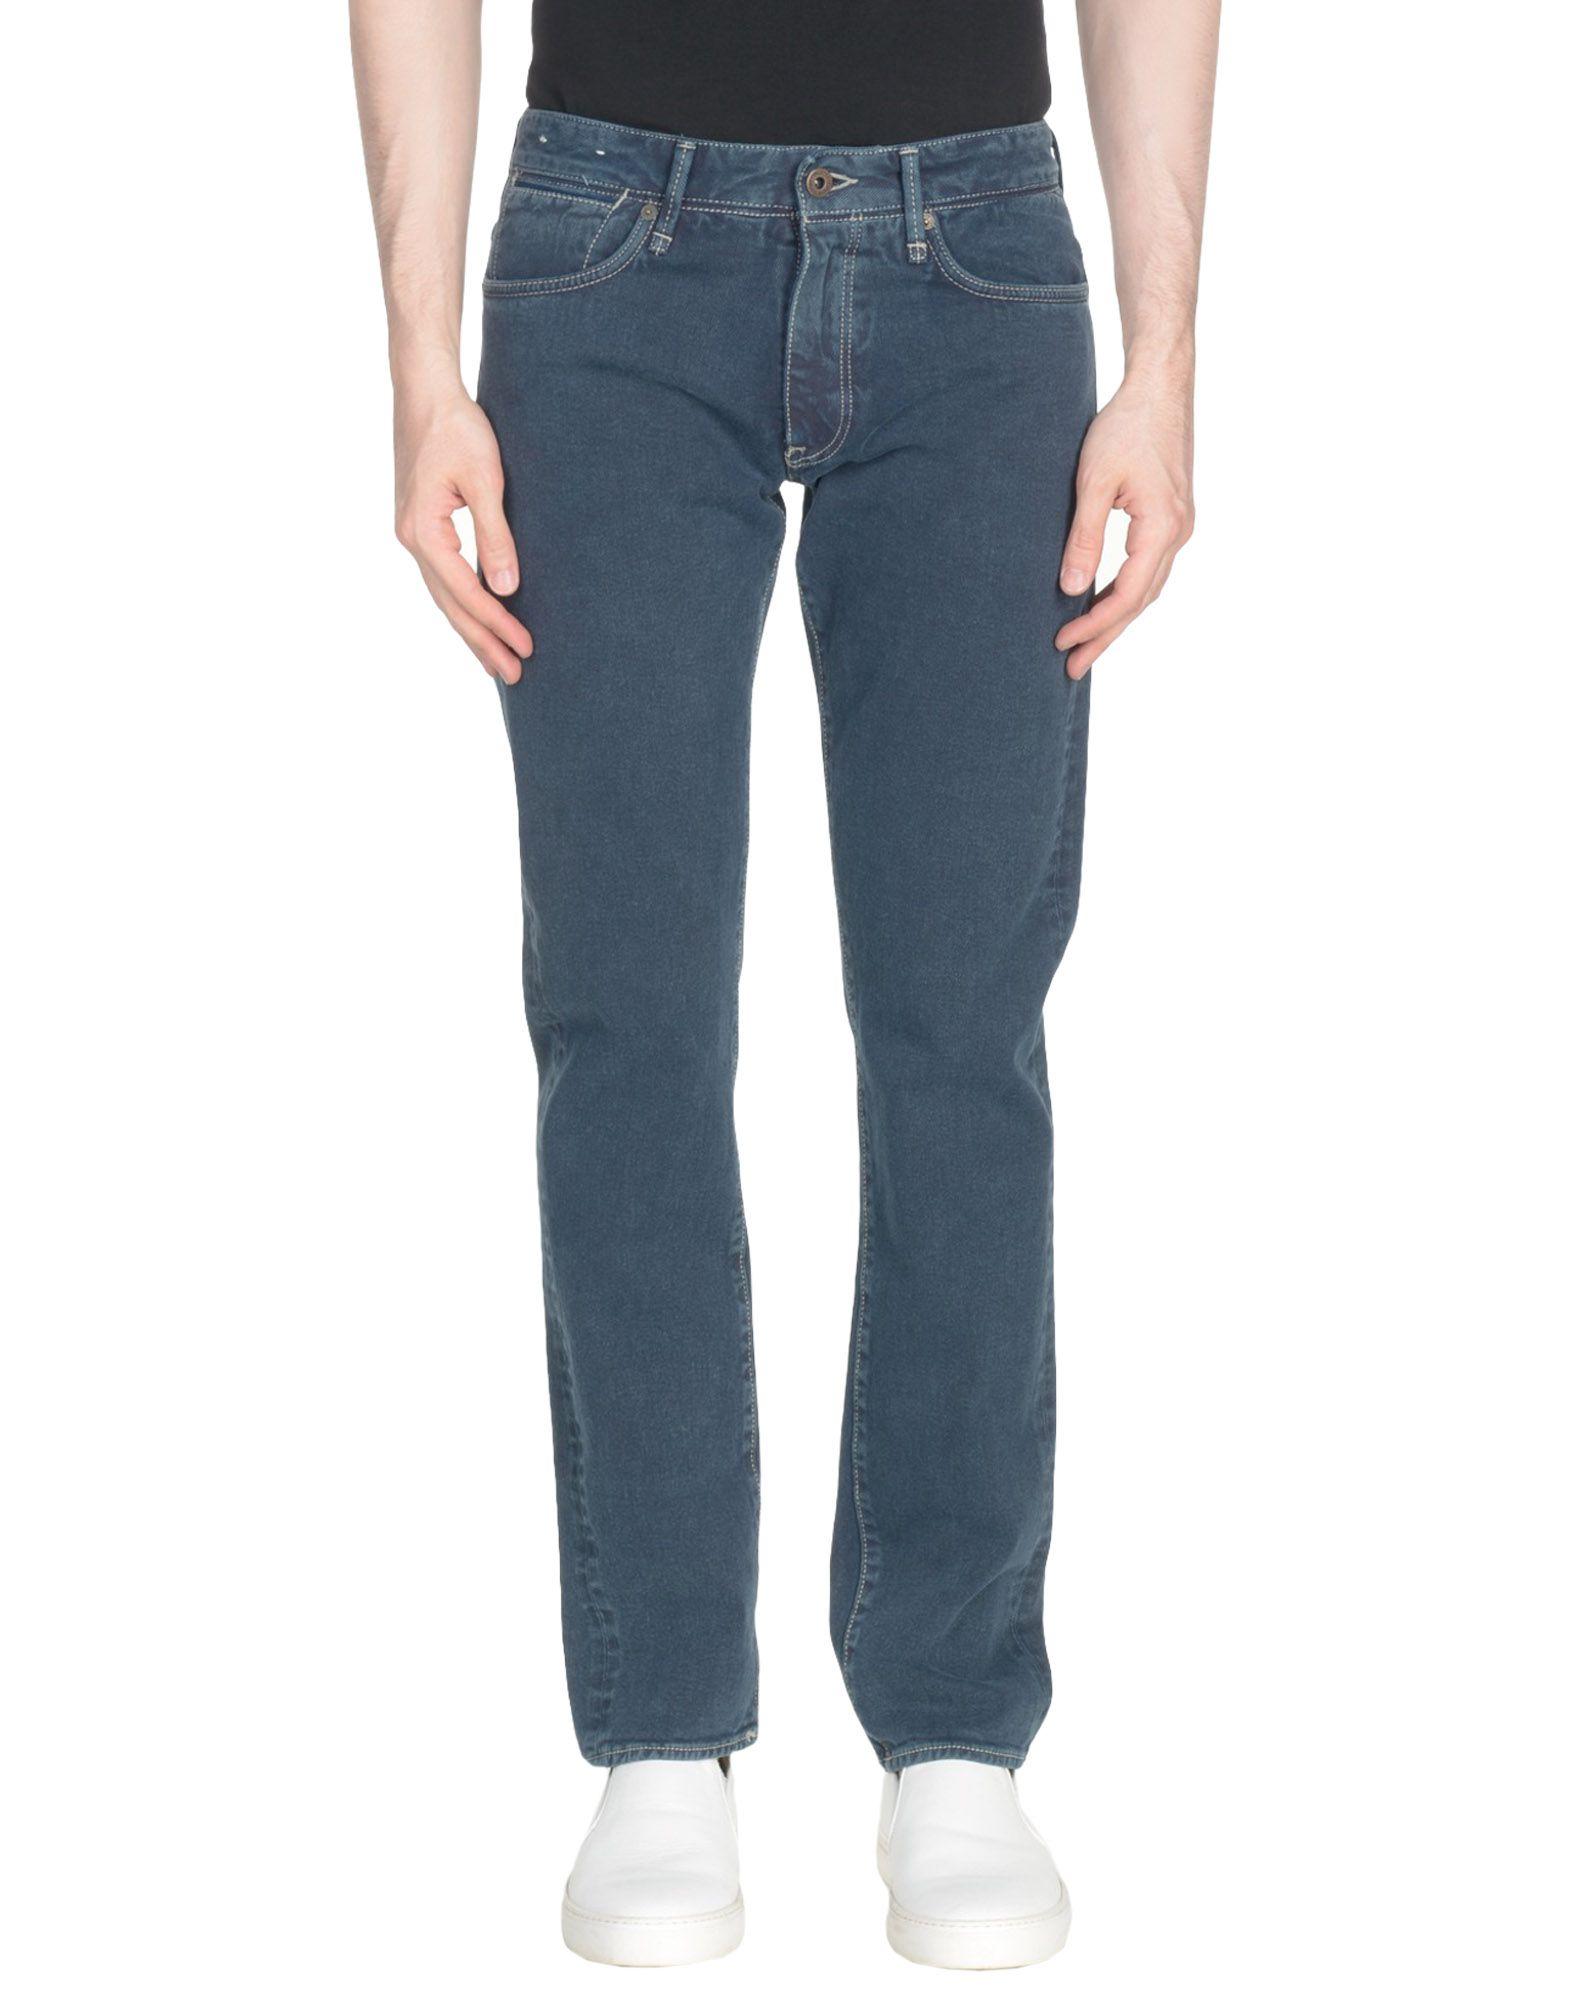 Pantaloni Jeans Incotex Donna - Acquista online su